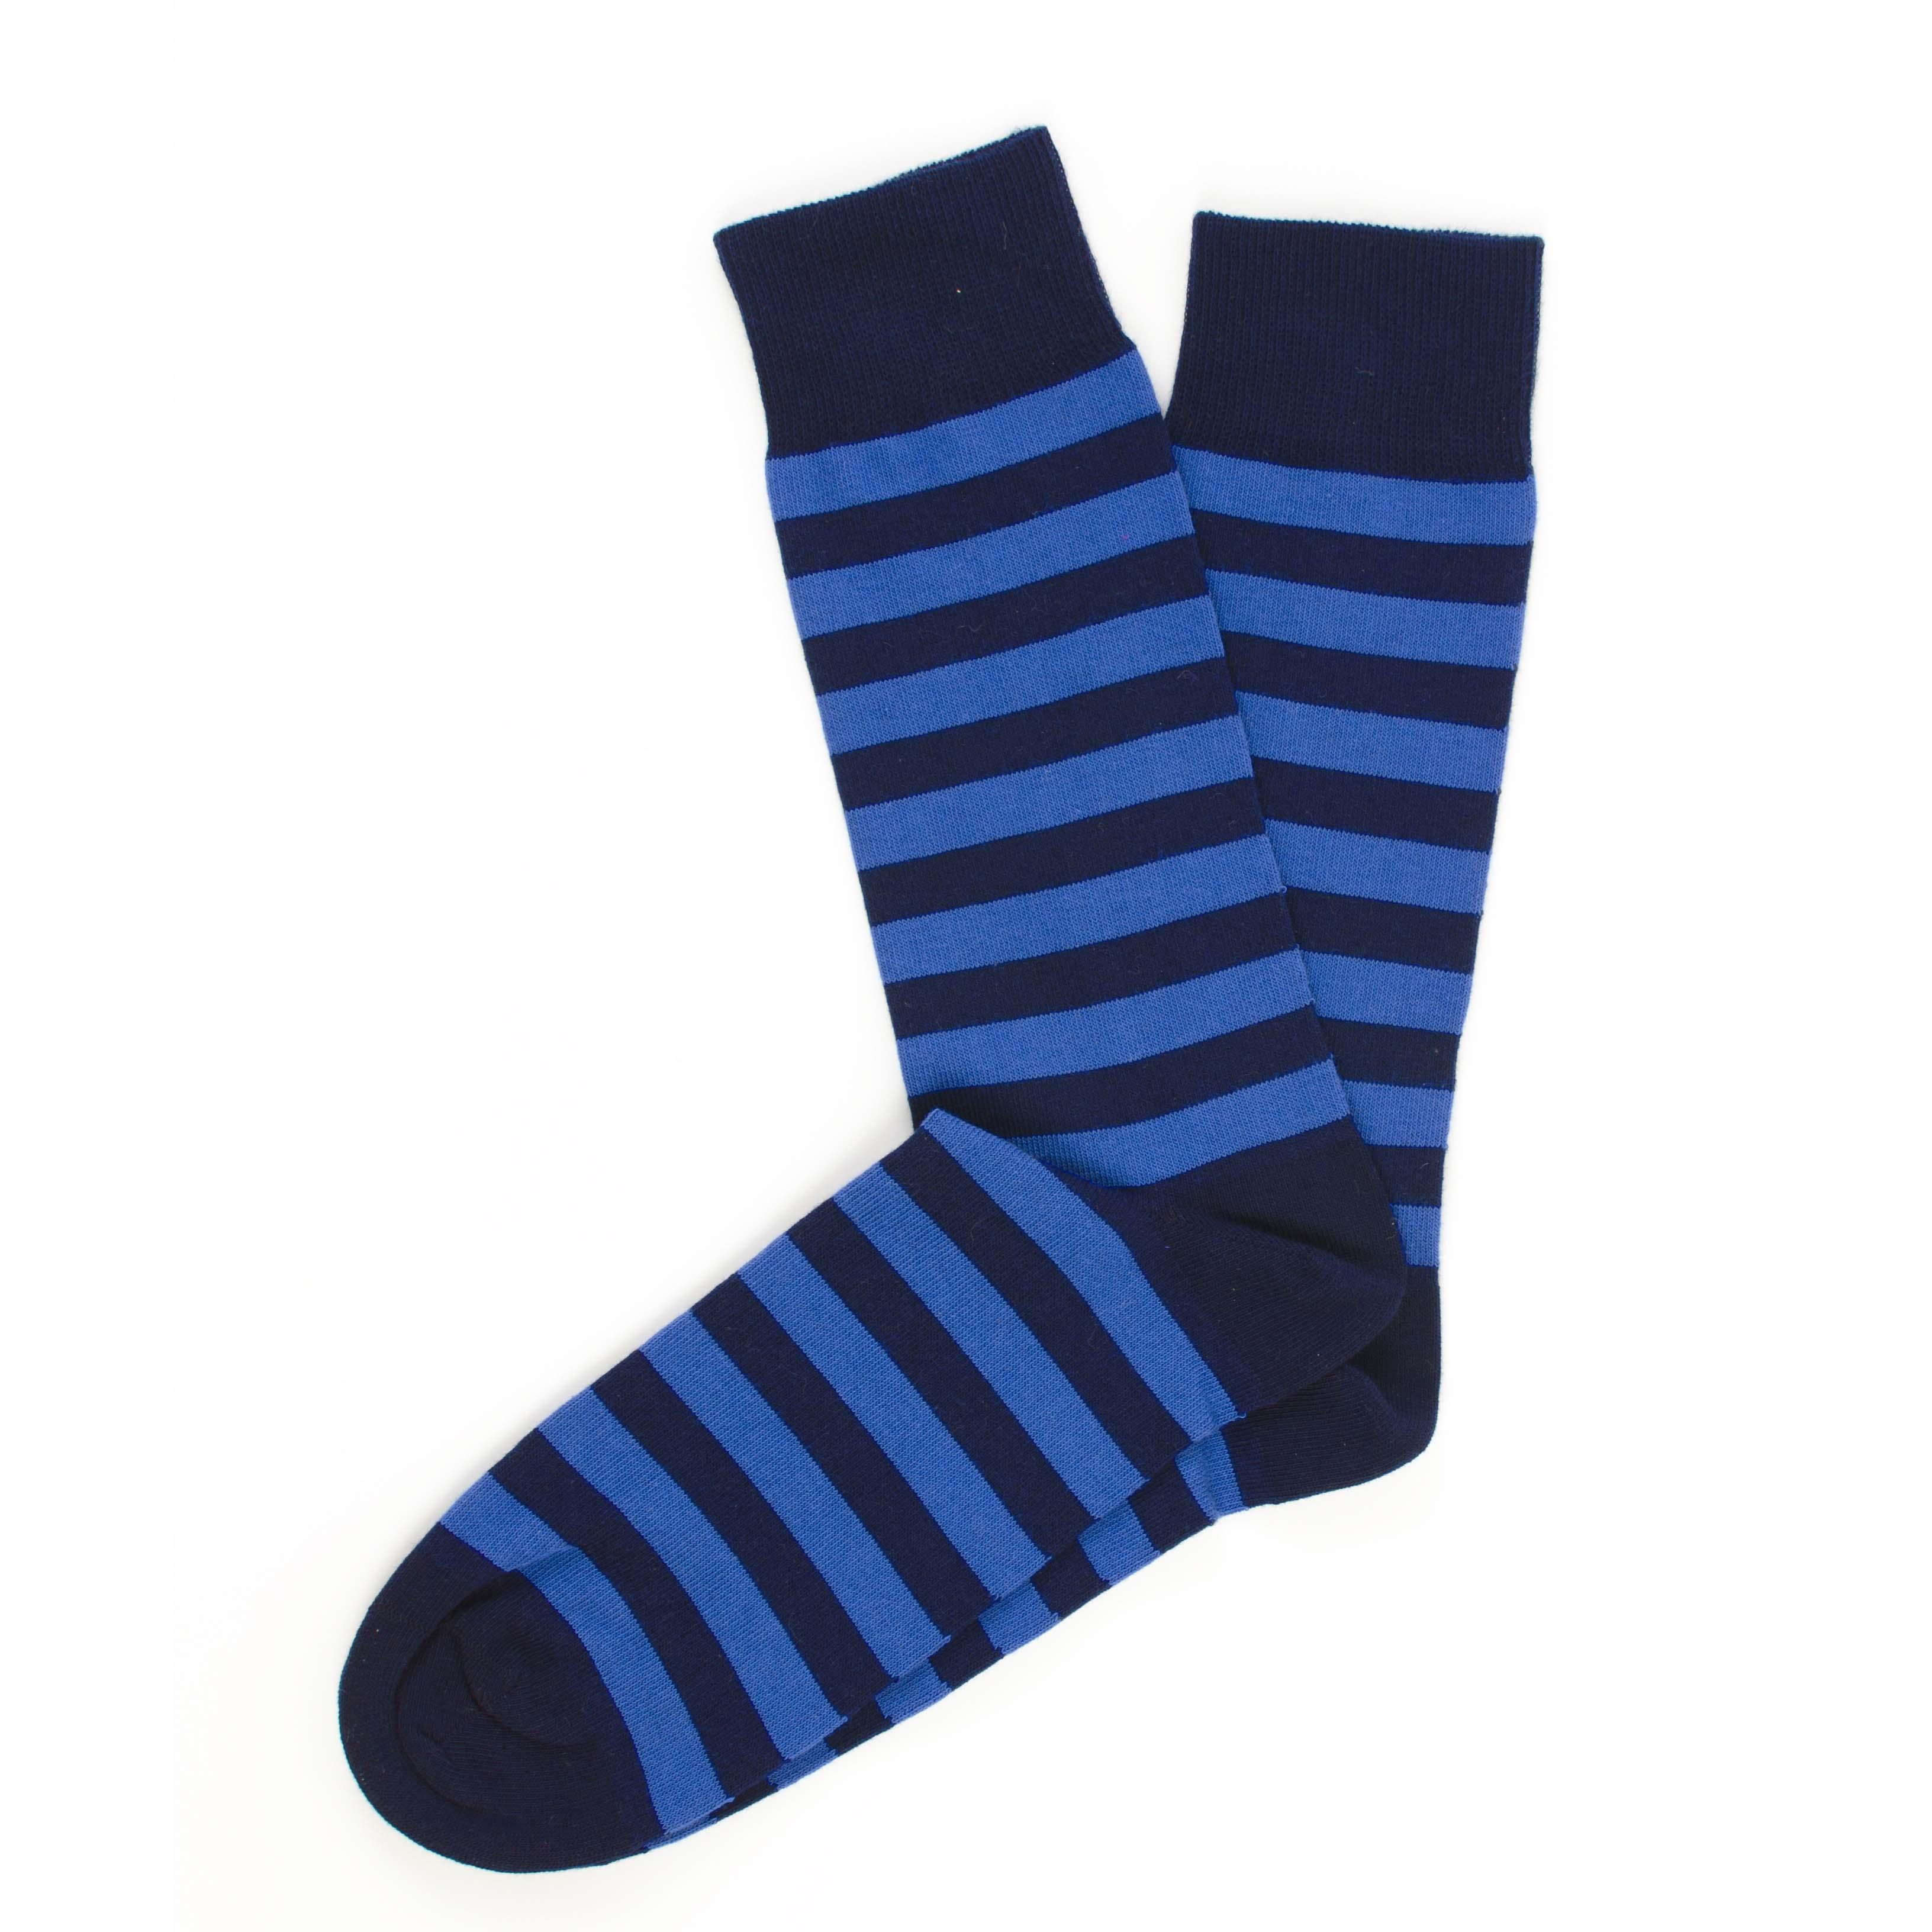 Socks navy, royal stripes